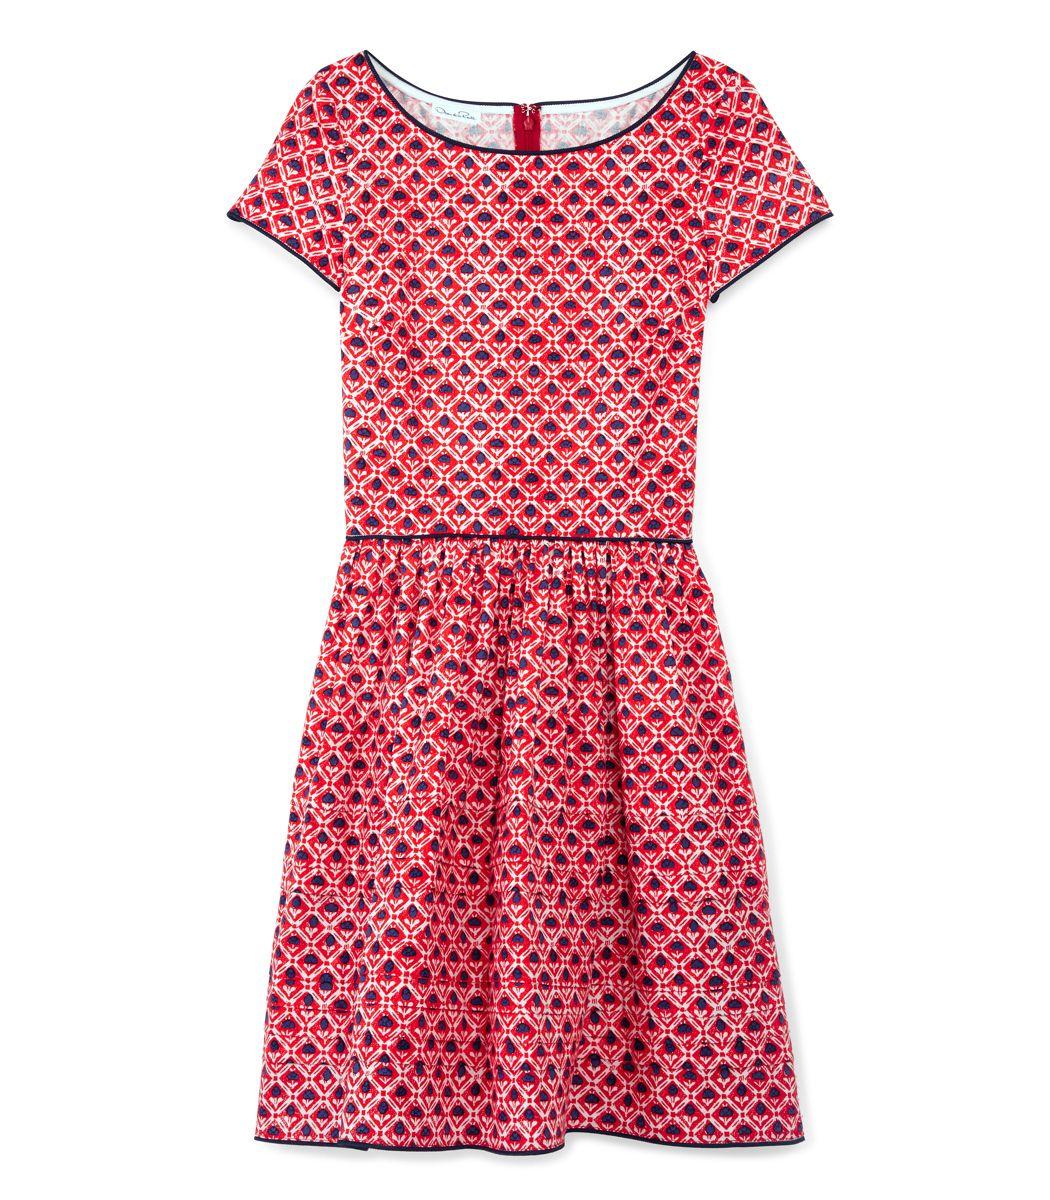 Red dresses at shopbazaar oscar de la renta poplin pansy floral